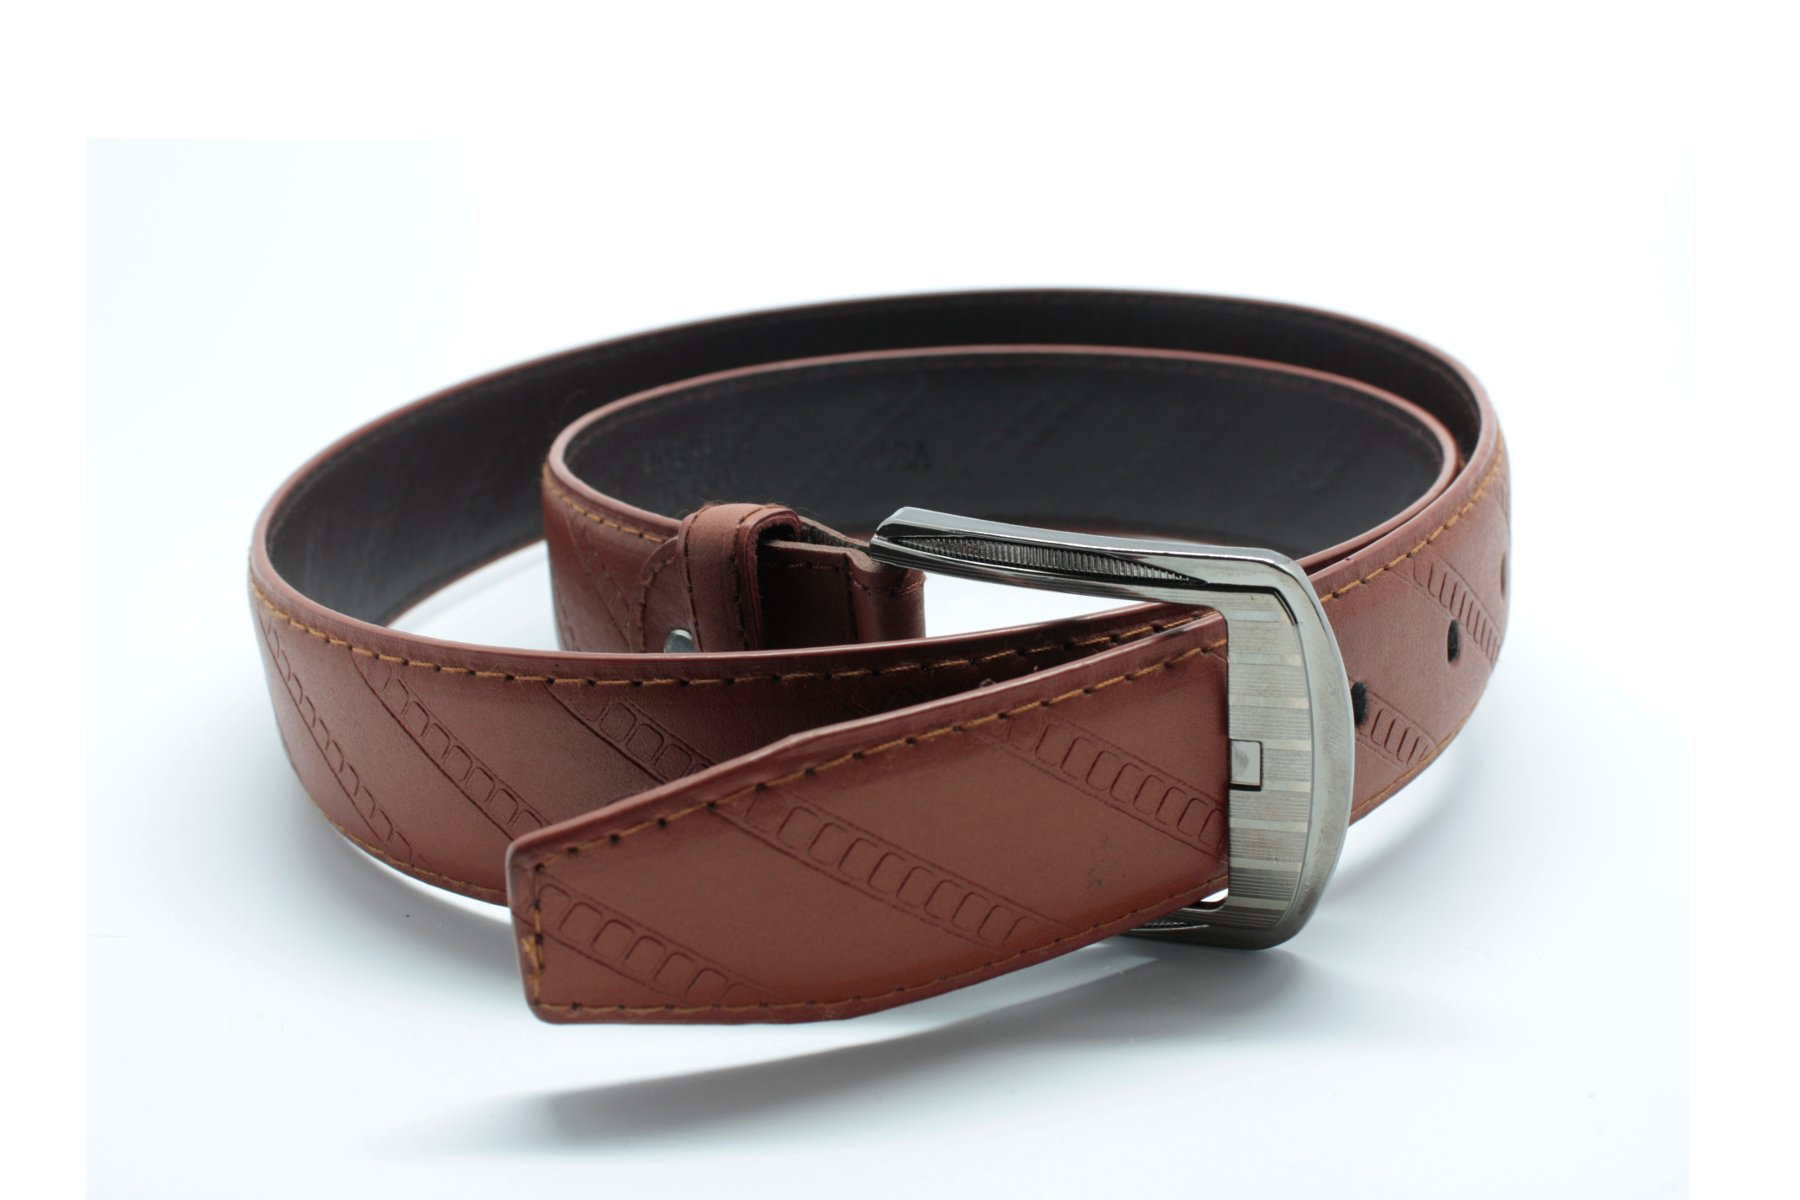 Men leather belt, Accessory, Safety, Men, Metal, HQ Photo